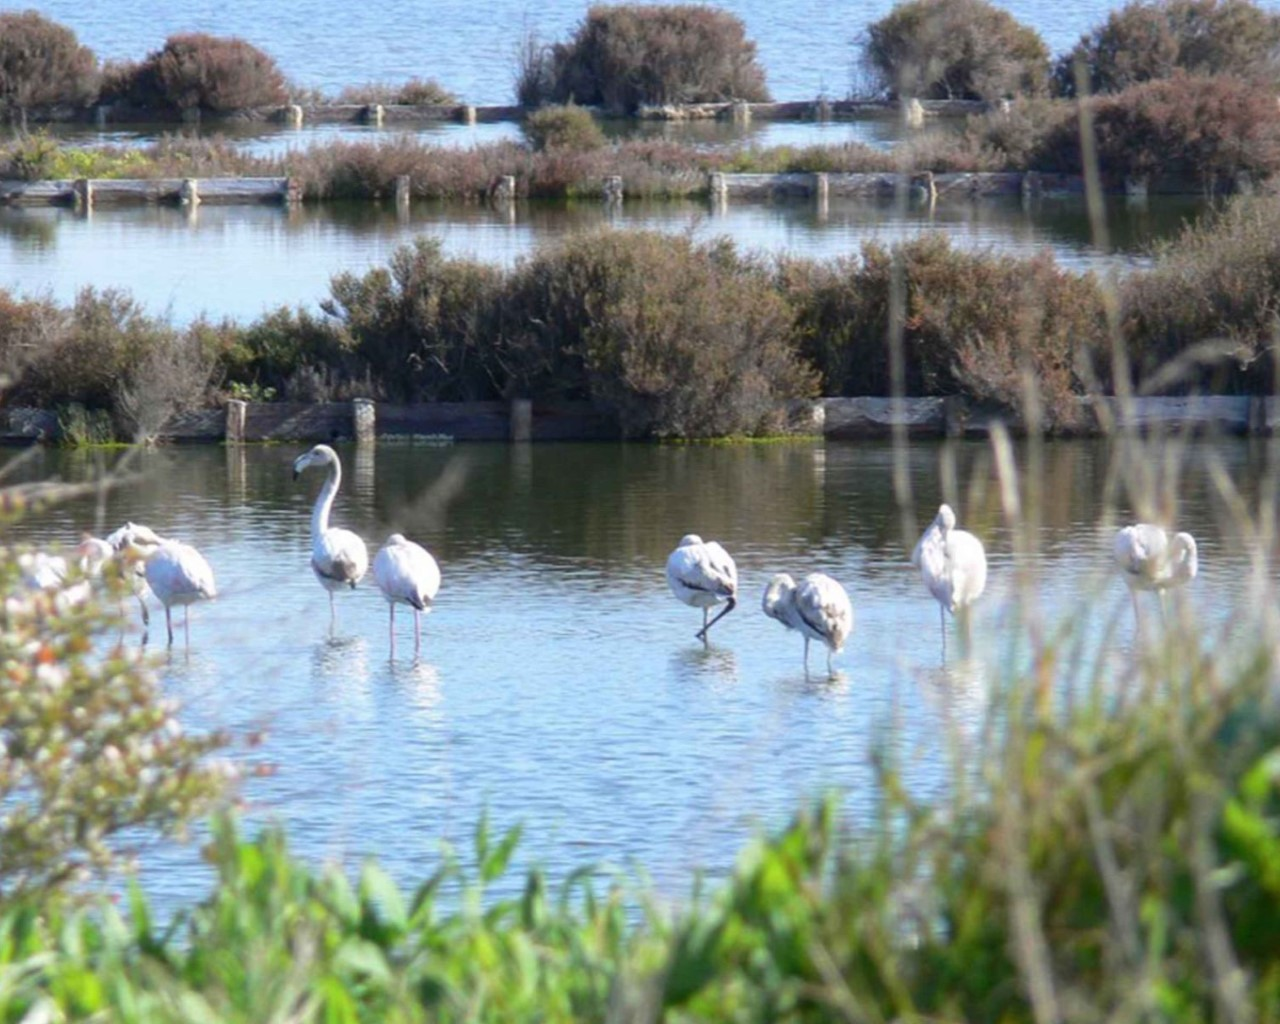 Reserve Naturelle Alcochete